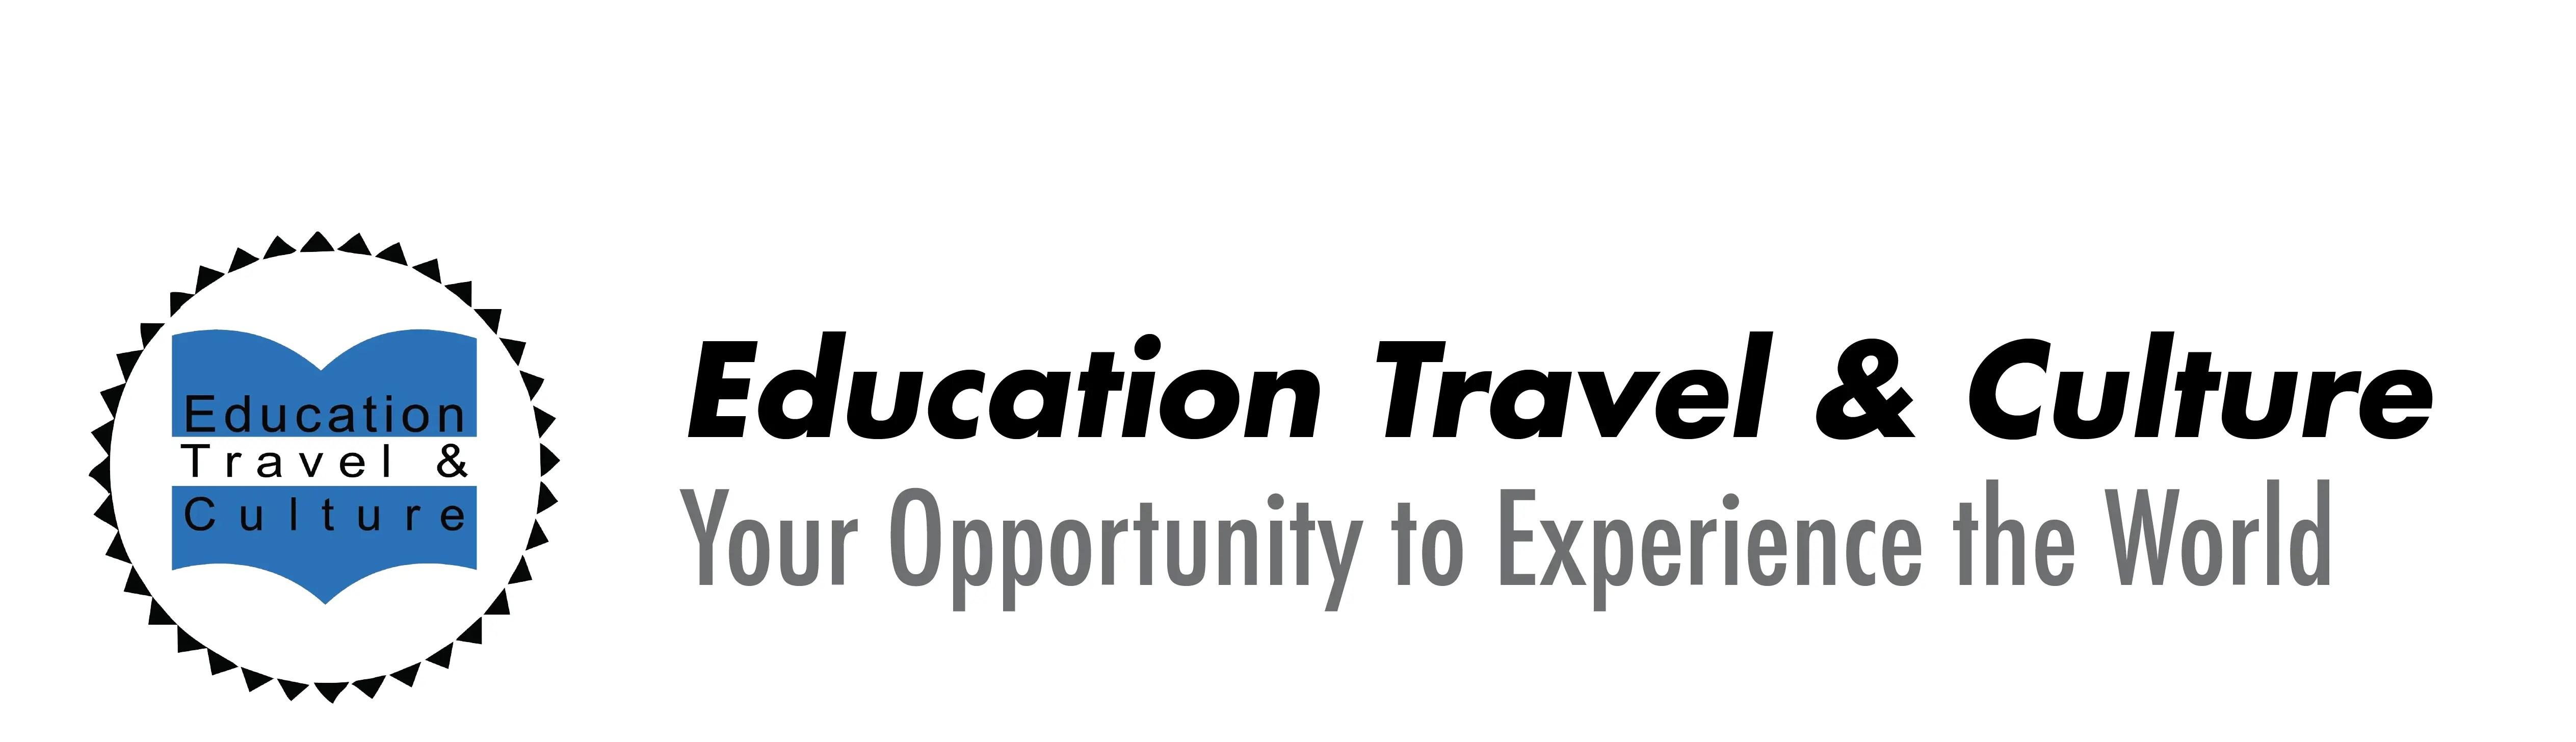 Education Travel & Culture